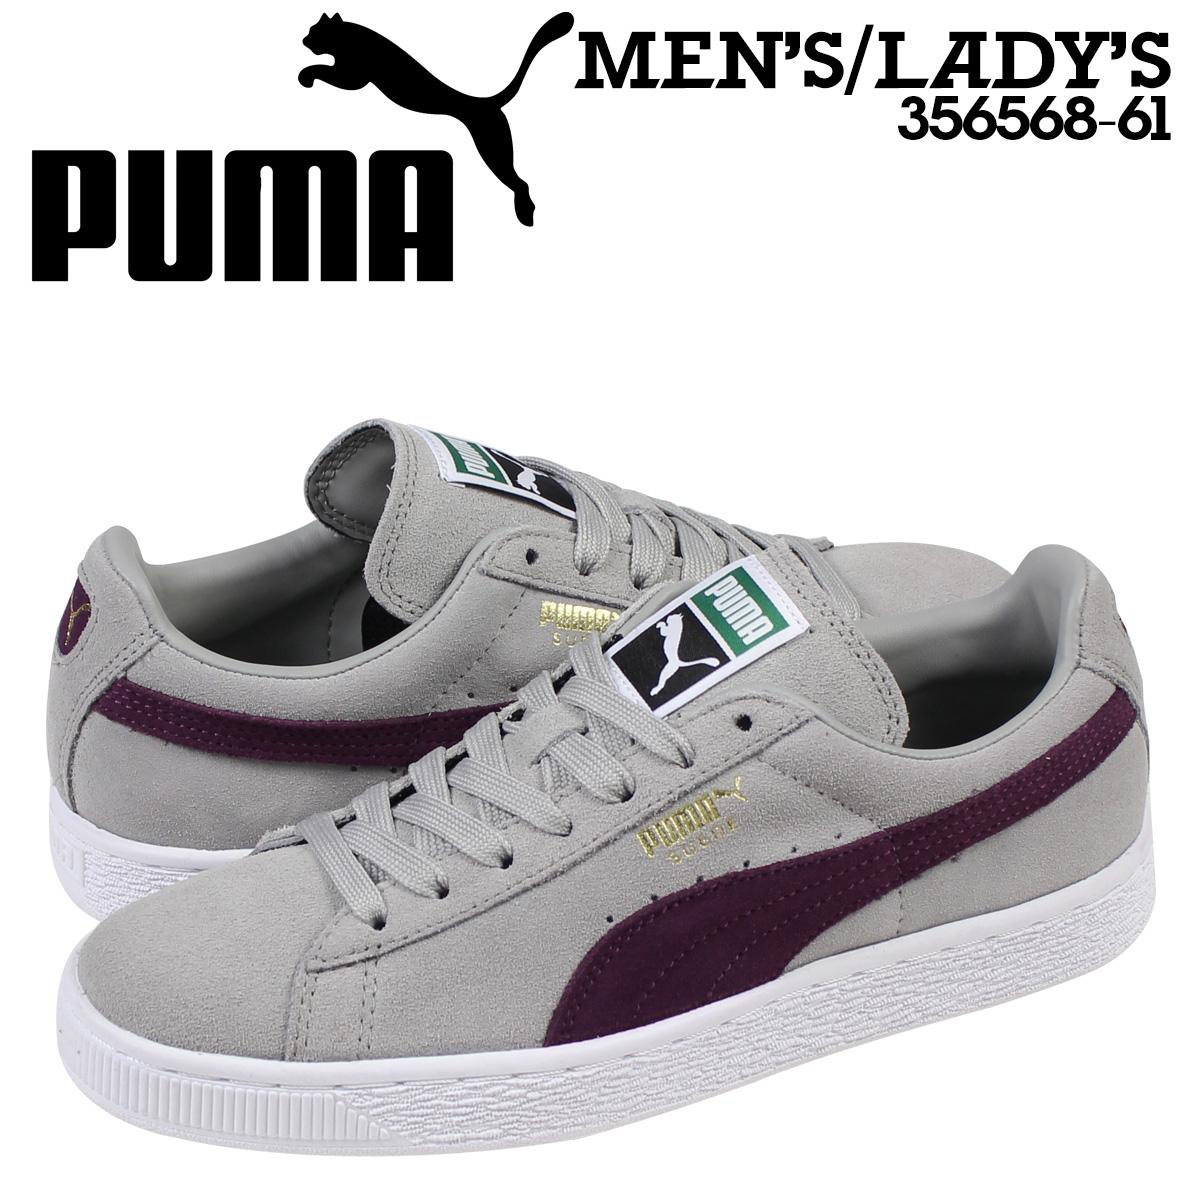 Puma PUMA suede classical music sneakers SUEDE CLASSIC + 356,568 61 men's lady's gray